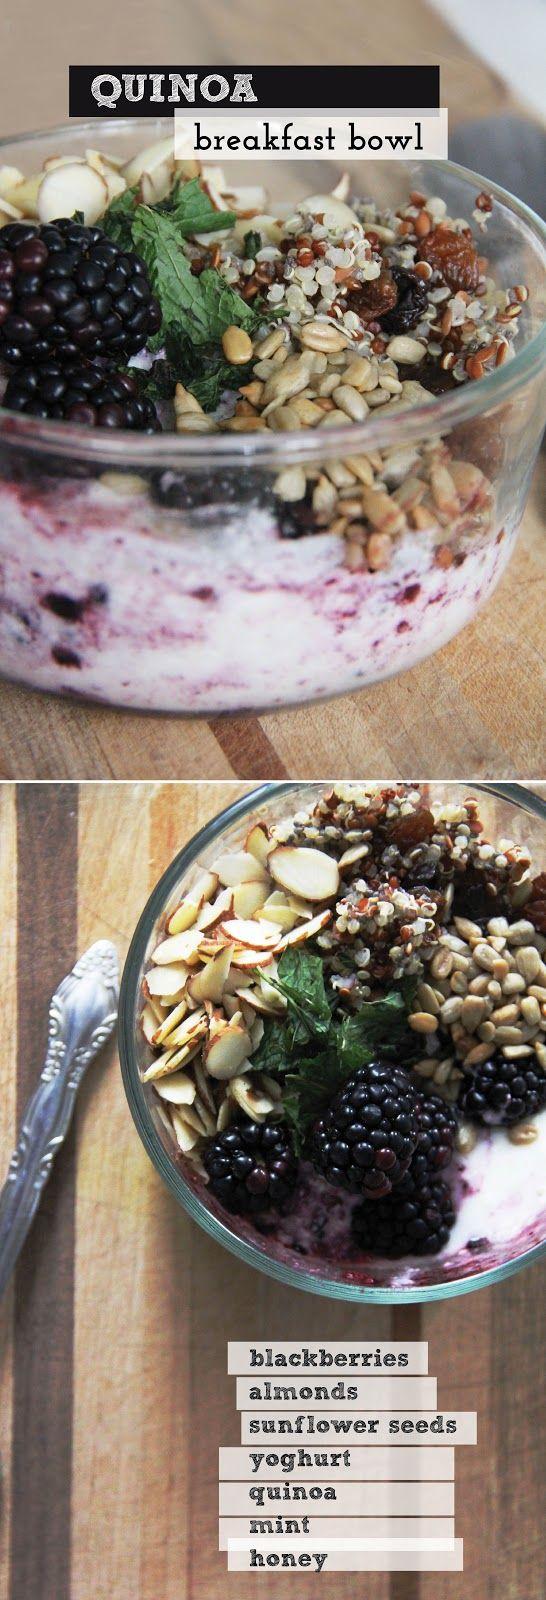 bona food: Quinoa Breakfast Bowl  blackberries, almonds, sunflower seeds, yogurt, quinoa, mint, honey